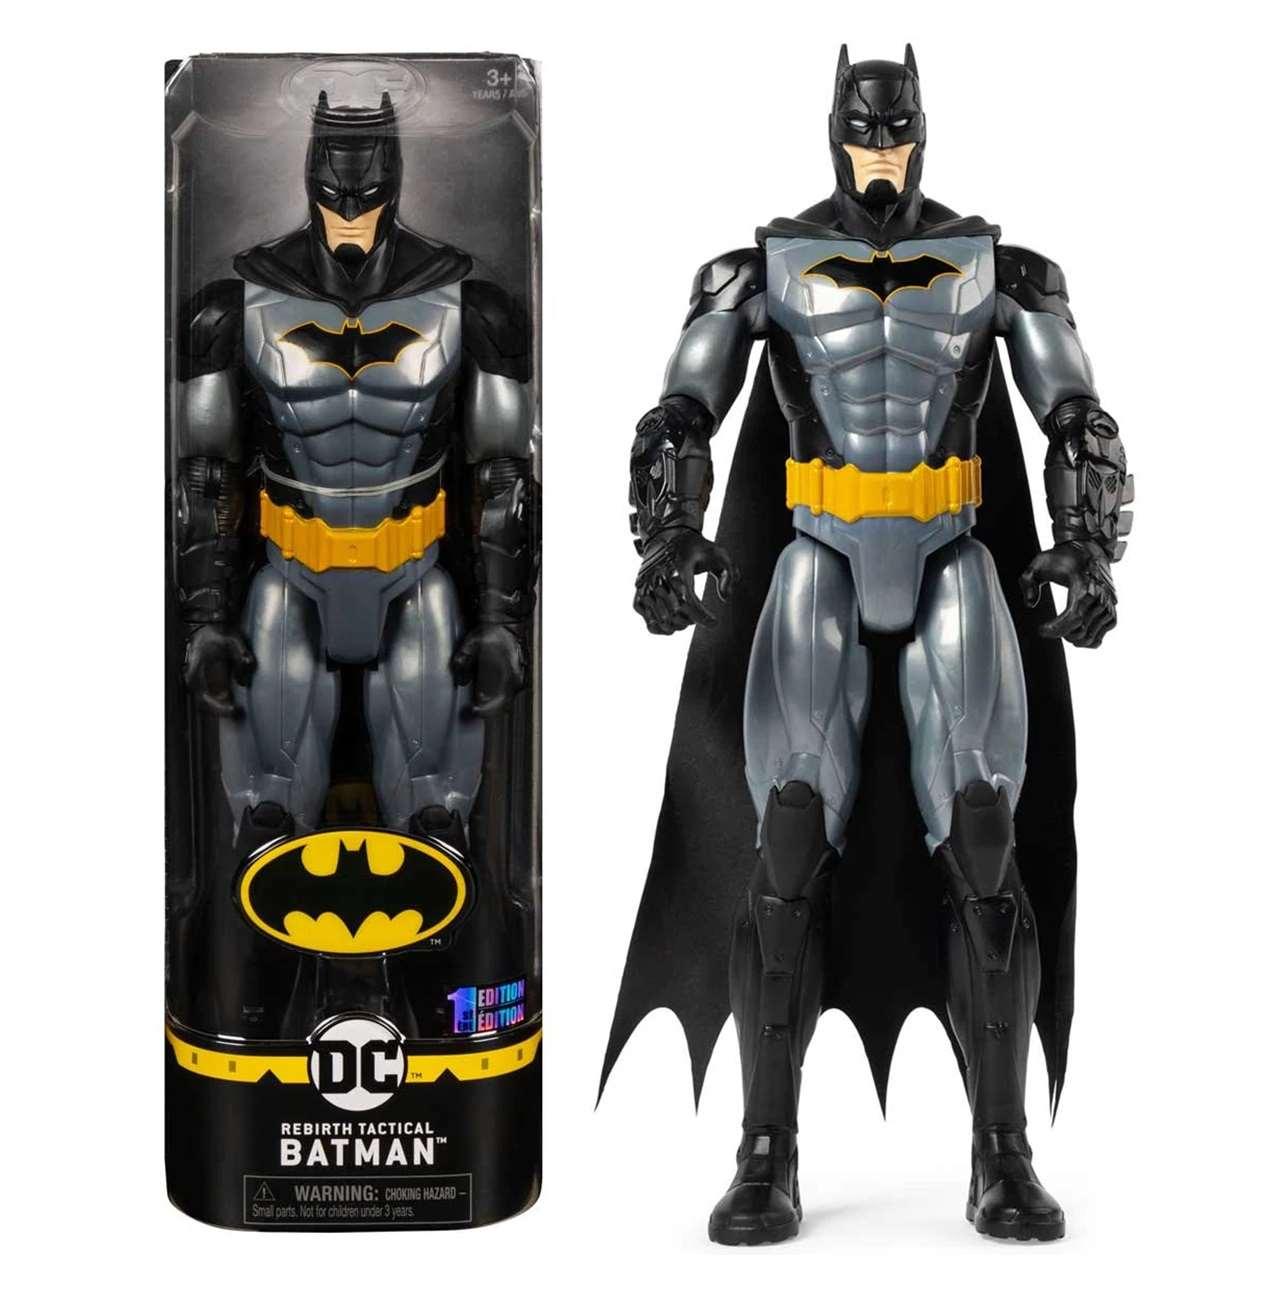 Batman Rebirth Tactical Figura The Caped Crusader Spin Master